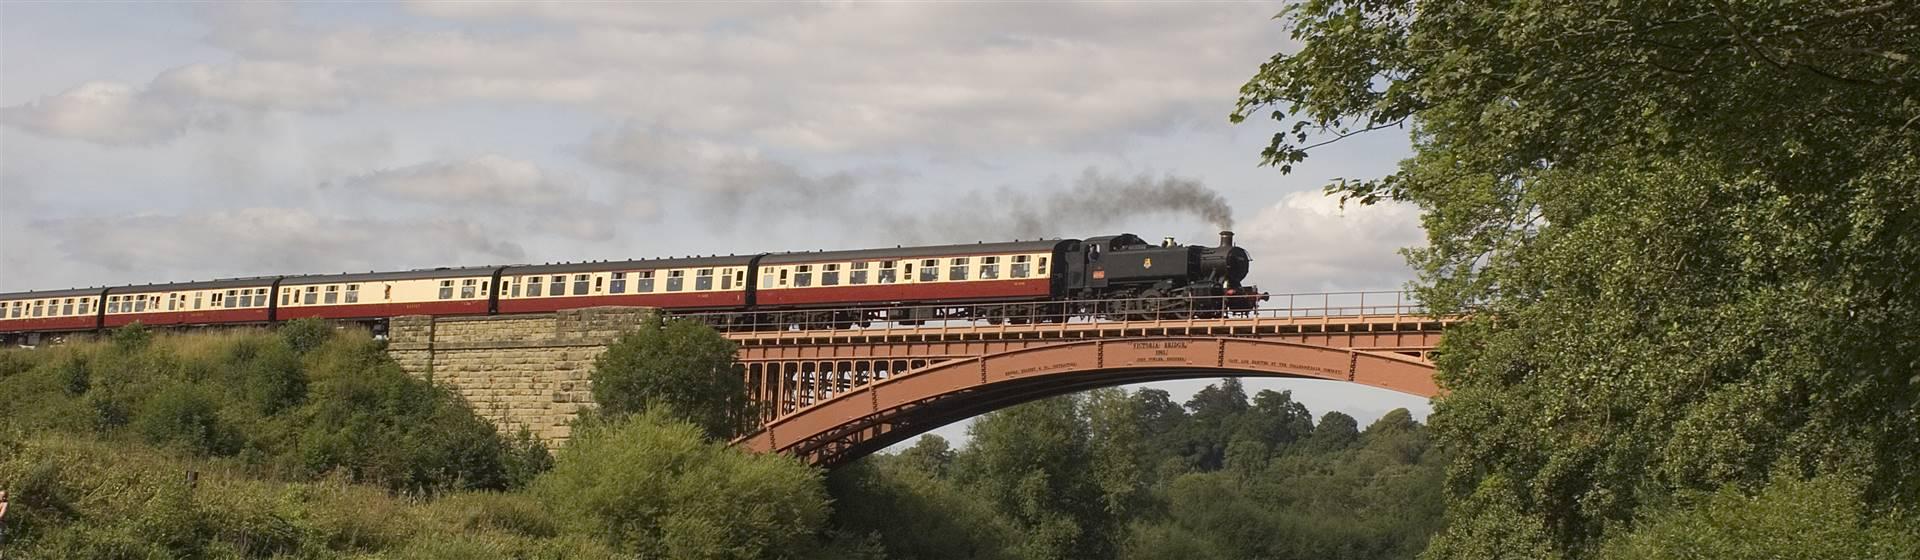 "<img src=""severnvalleyrailway-adobestock.jpeg"" alt=""Severn Valley Railway""/>"